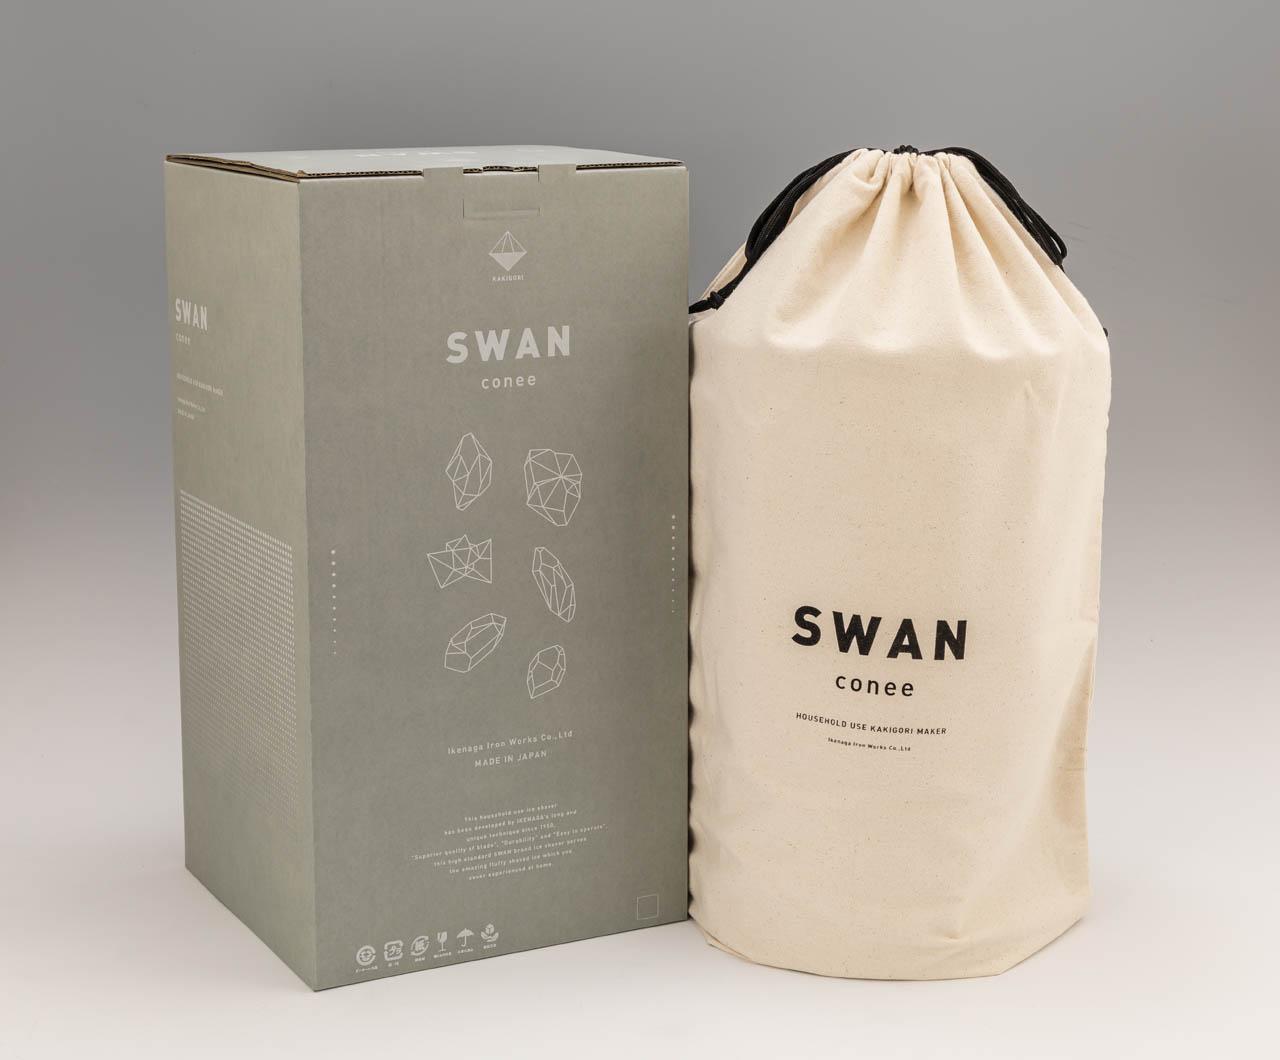 SWAN conee (スワン コニー)